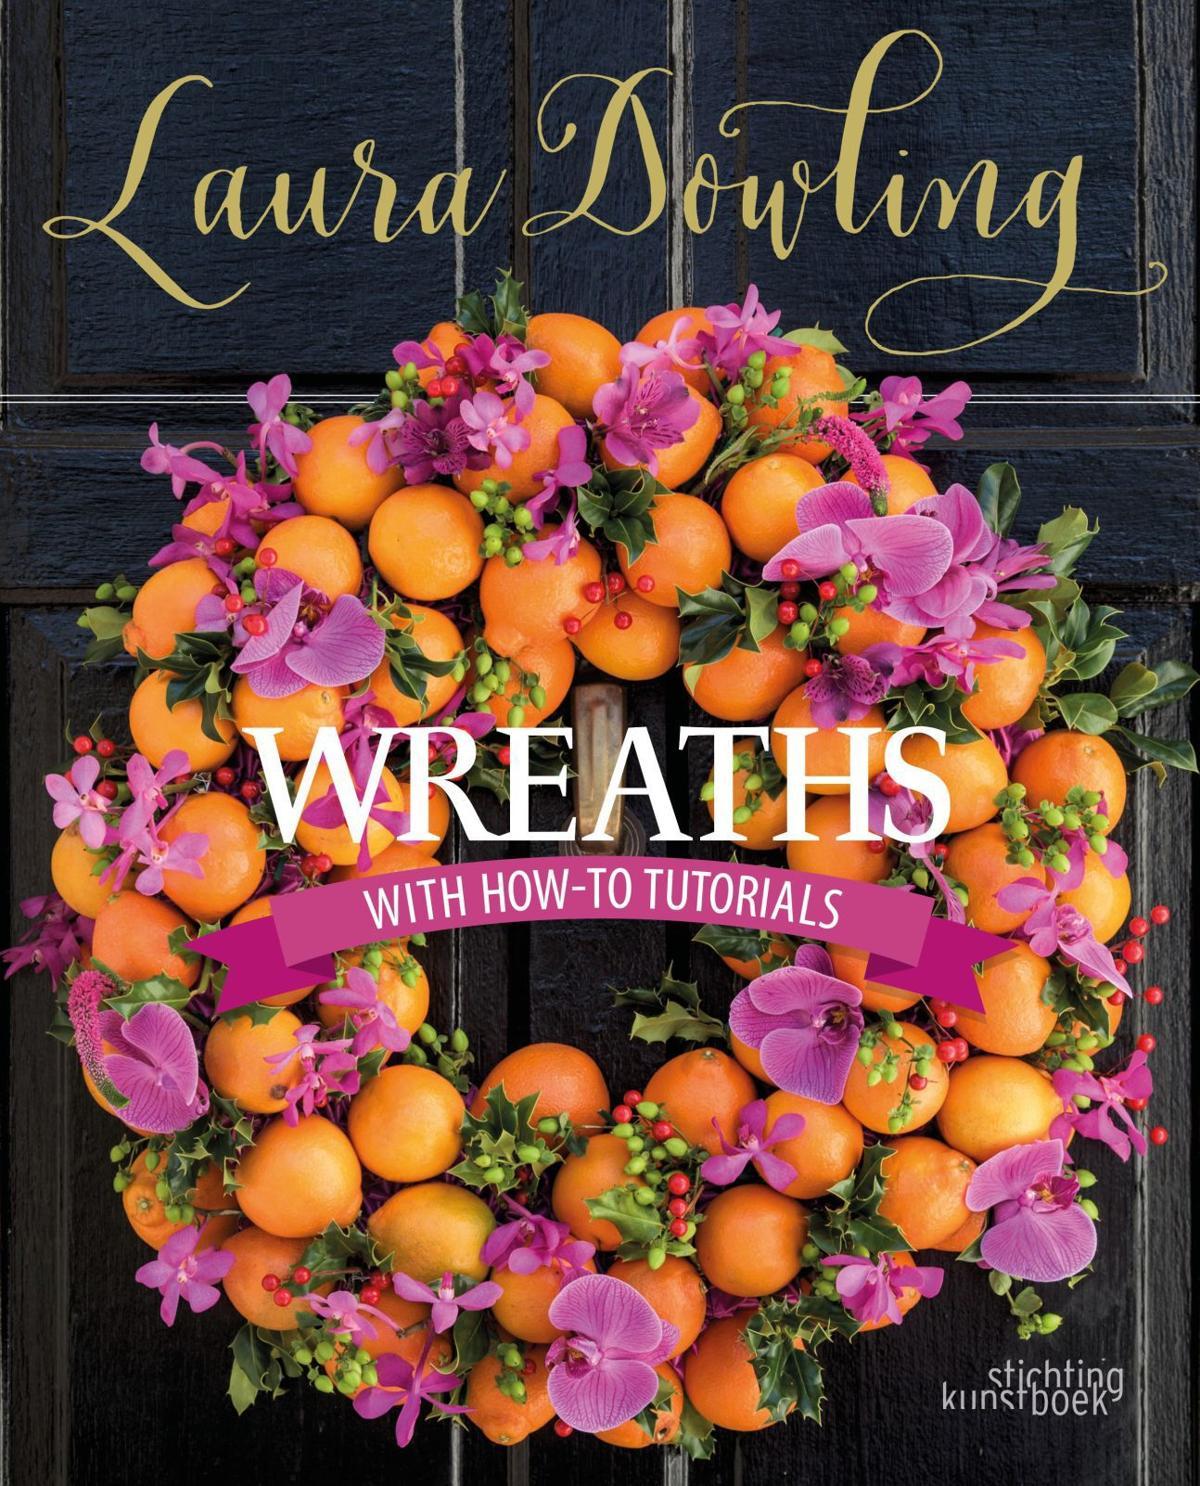 Wreath revival